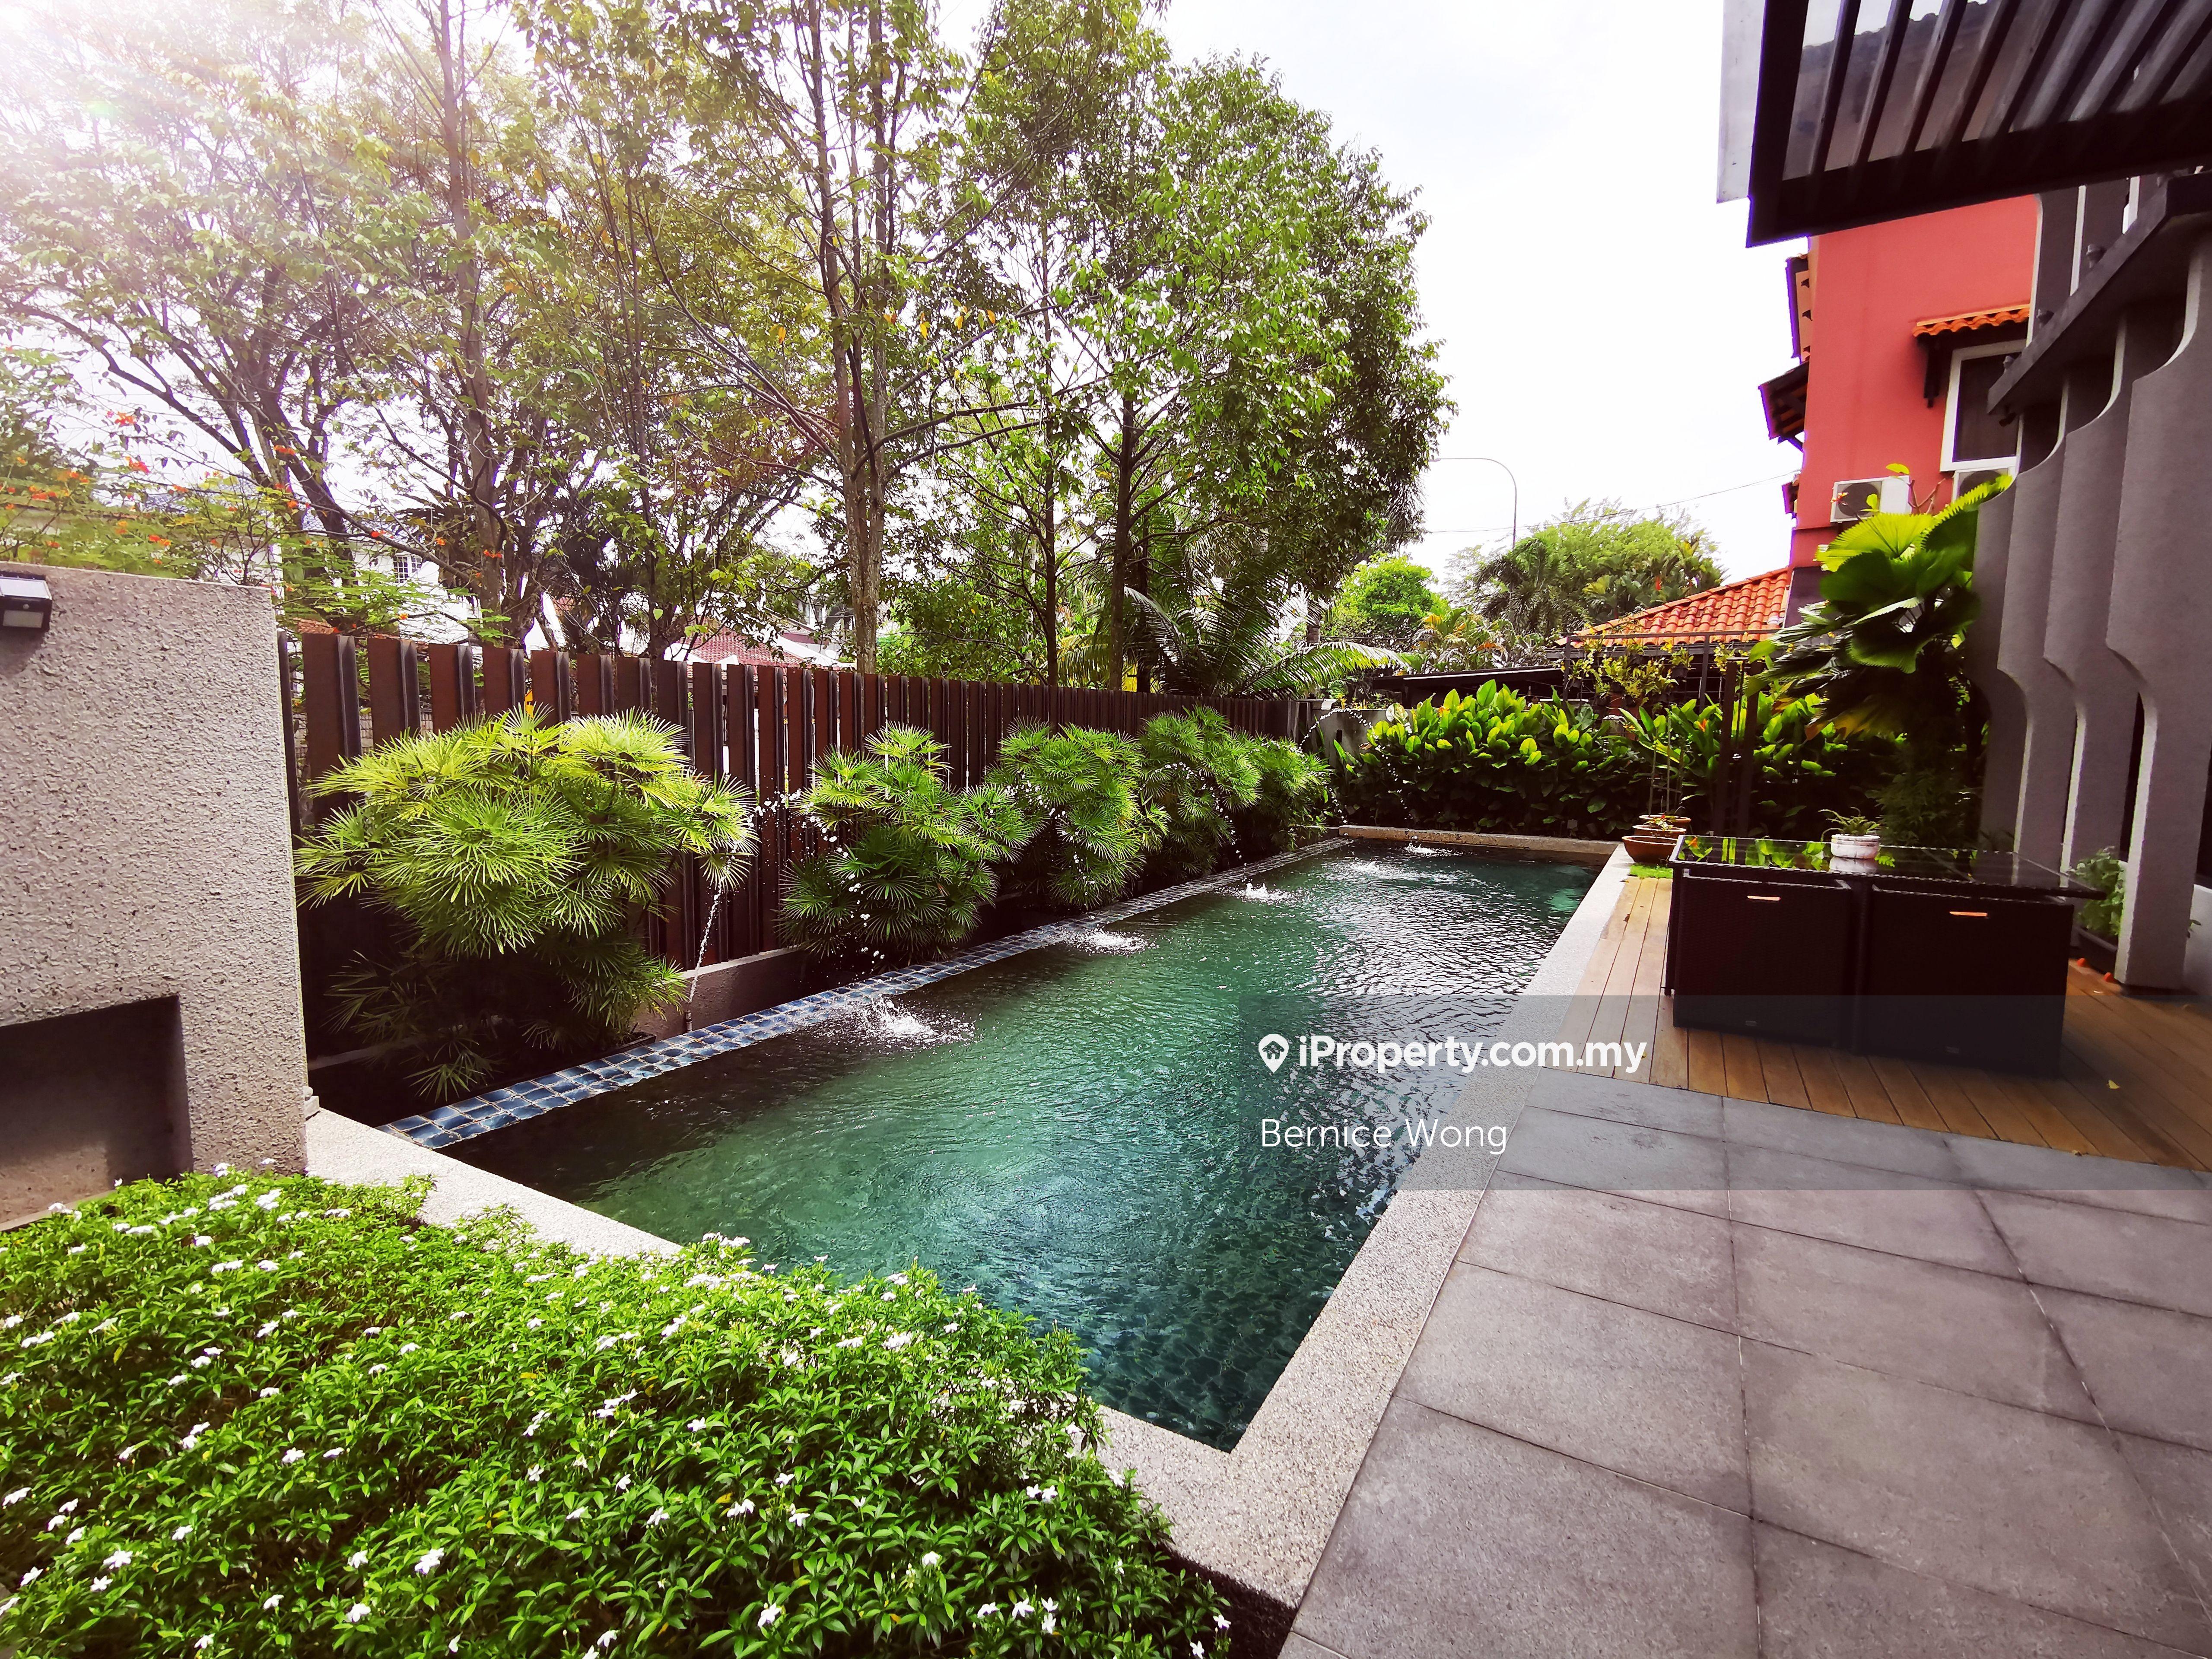 Damansara Heights, Bangsar, Kuala Lumpur, Damansara Heights